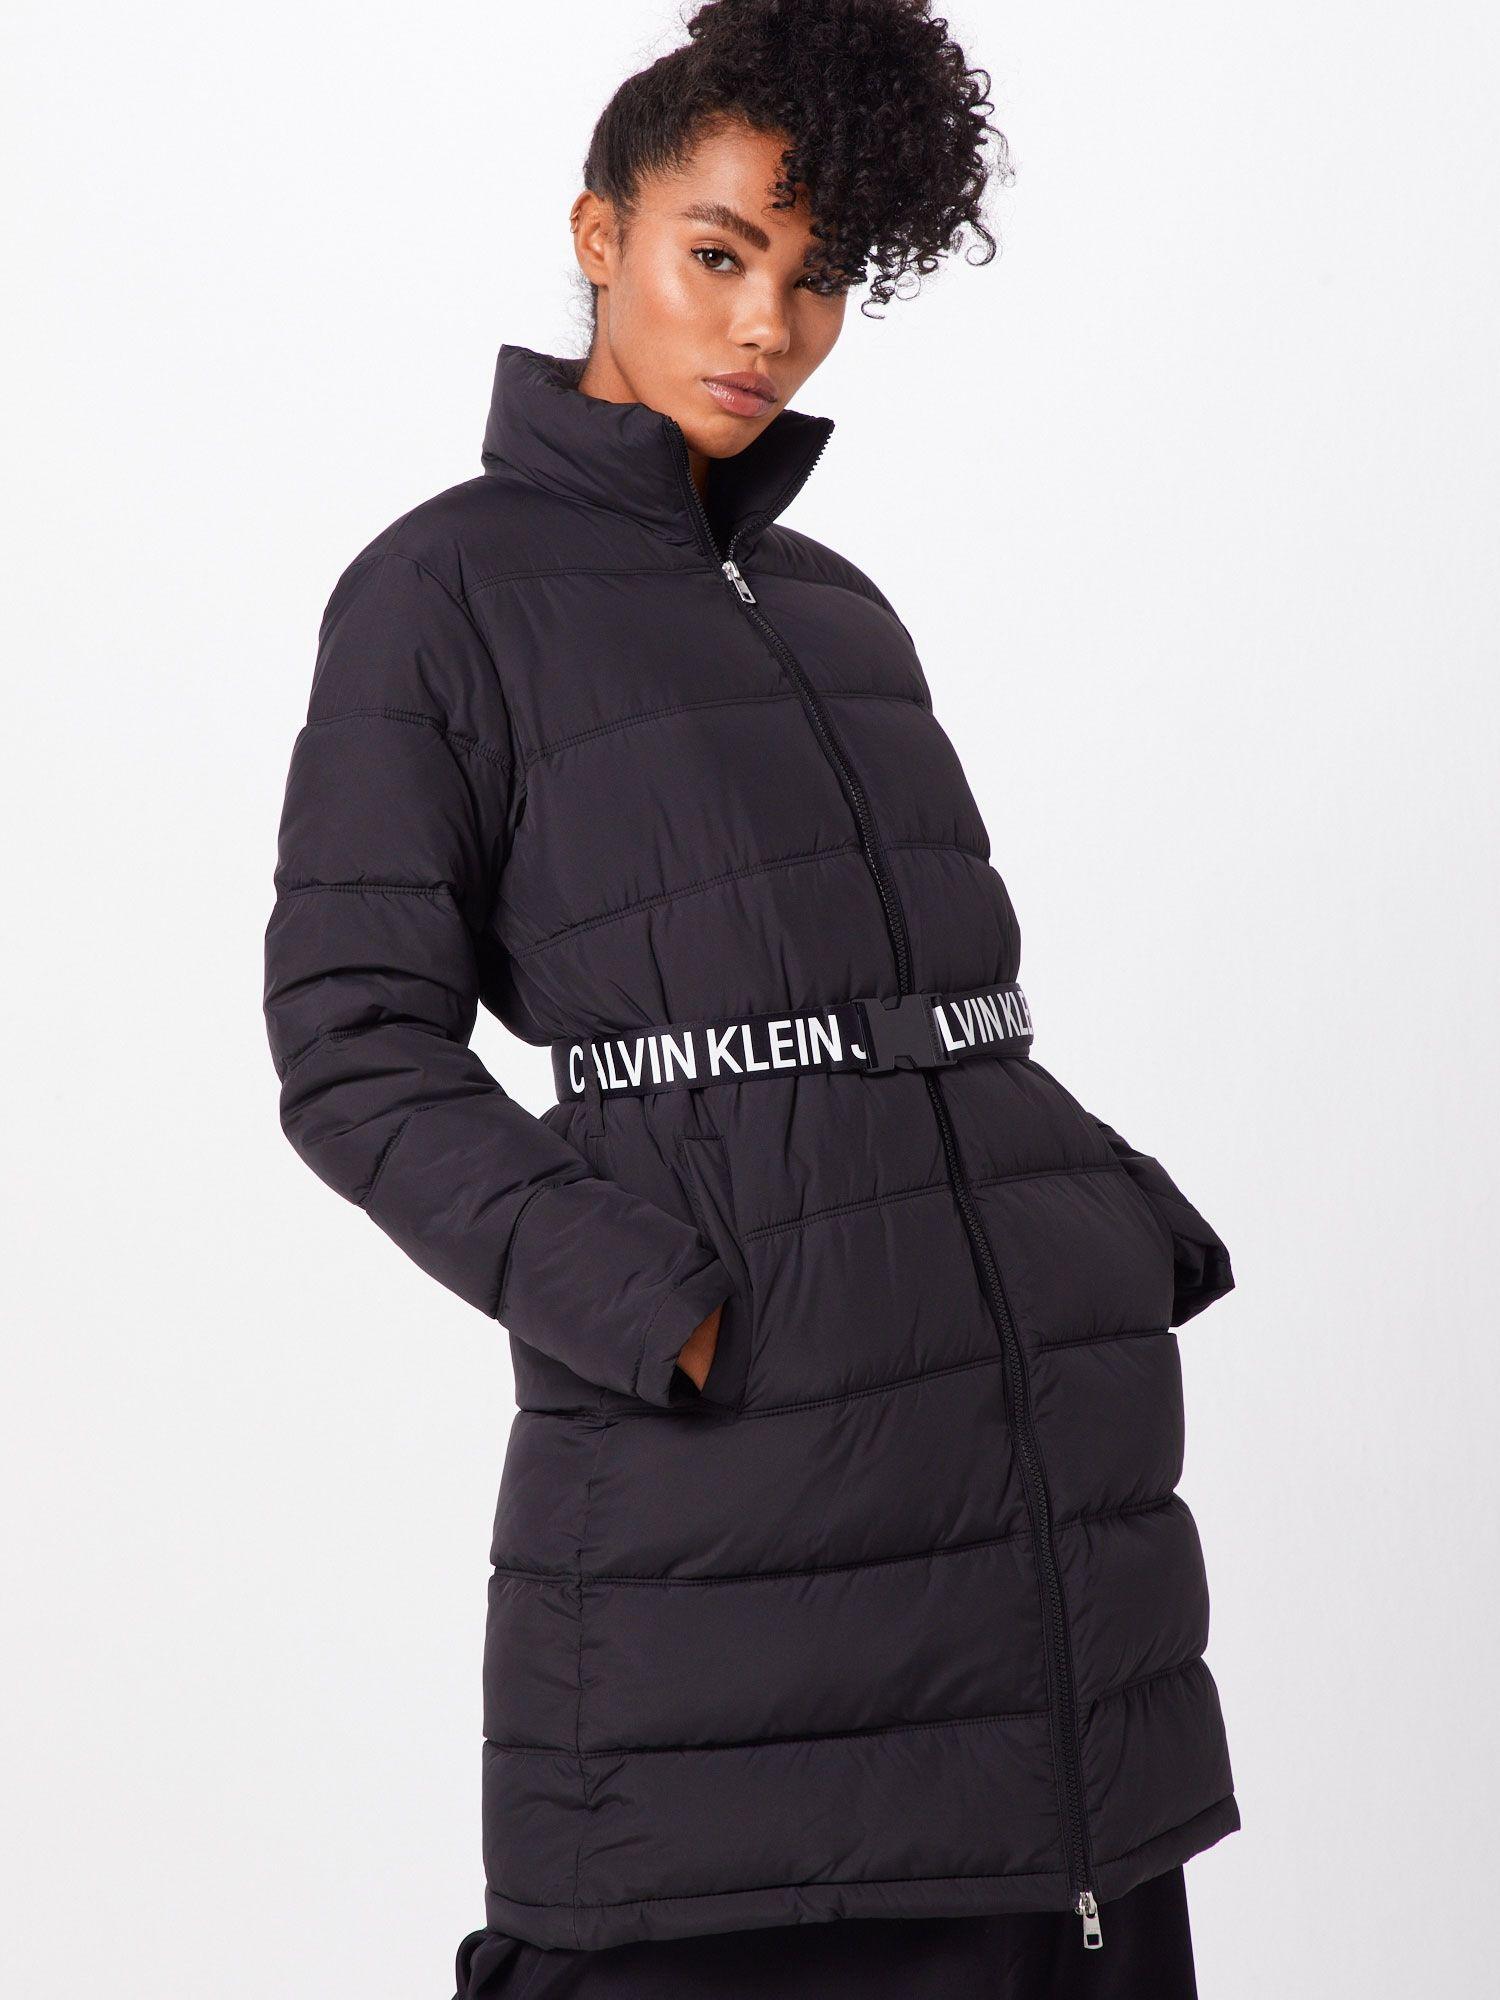 Calvin Klein Jeans Mantel Long Puffer With Waist Belt Damen Schwarz Grosse Xl Models Wintermantel Und Mantel